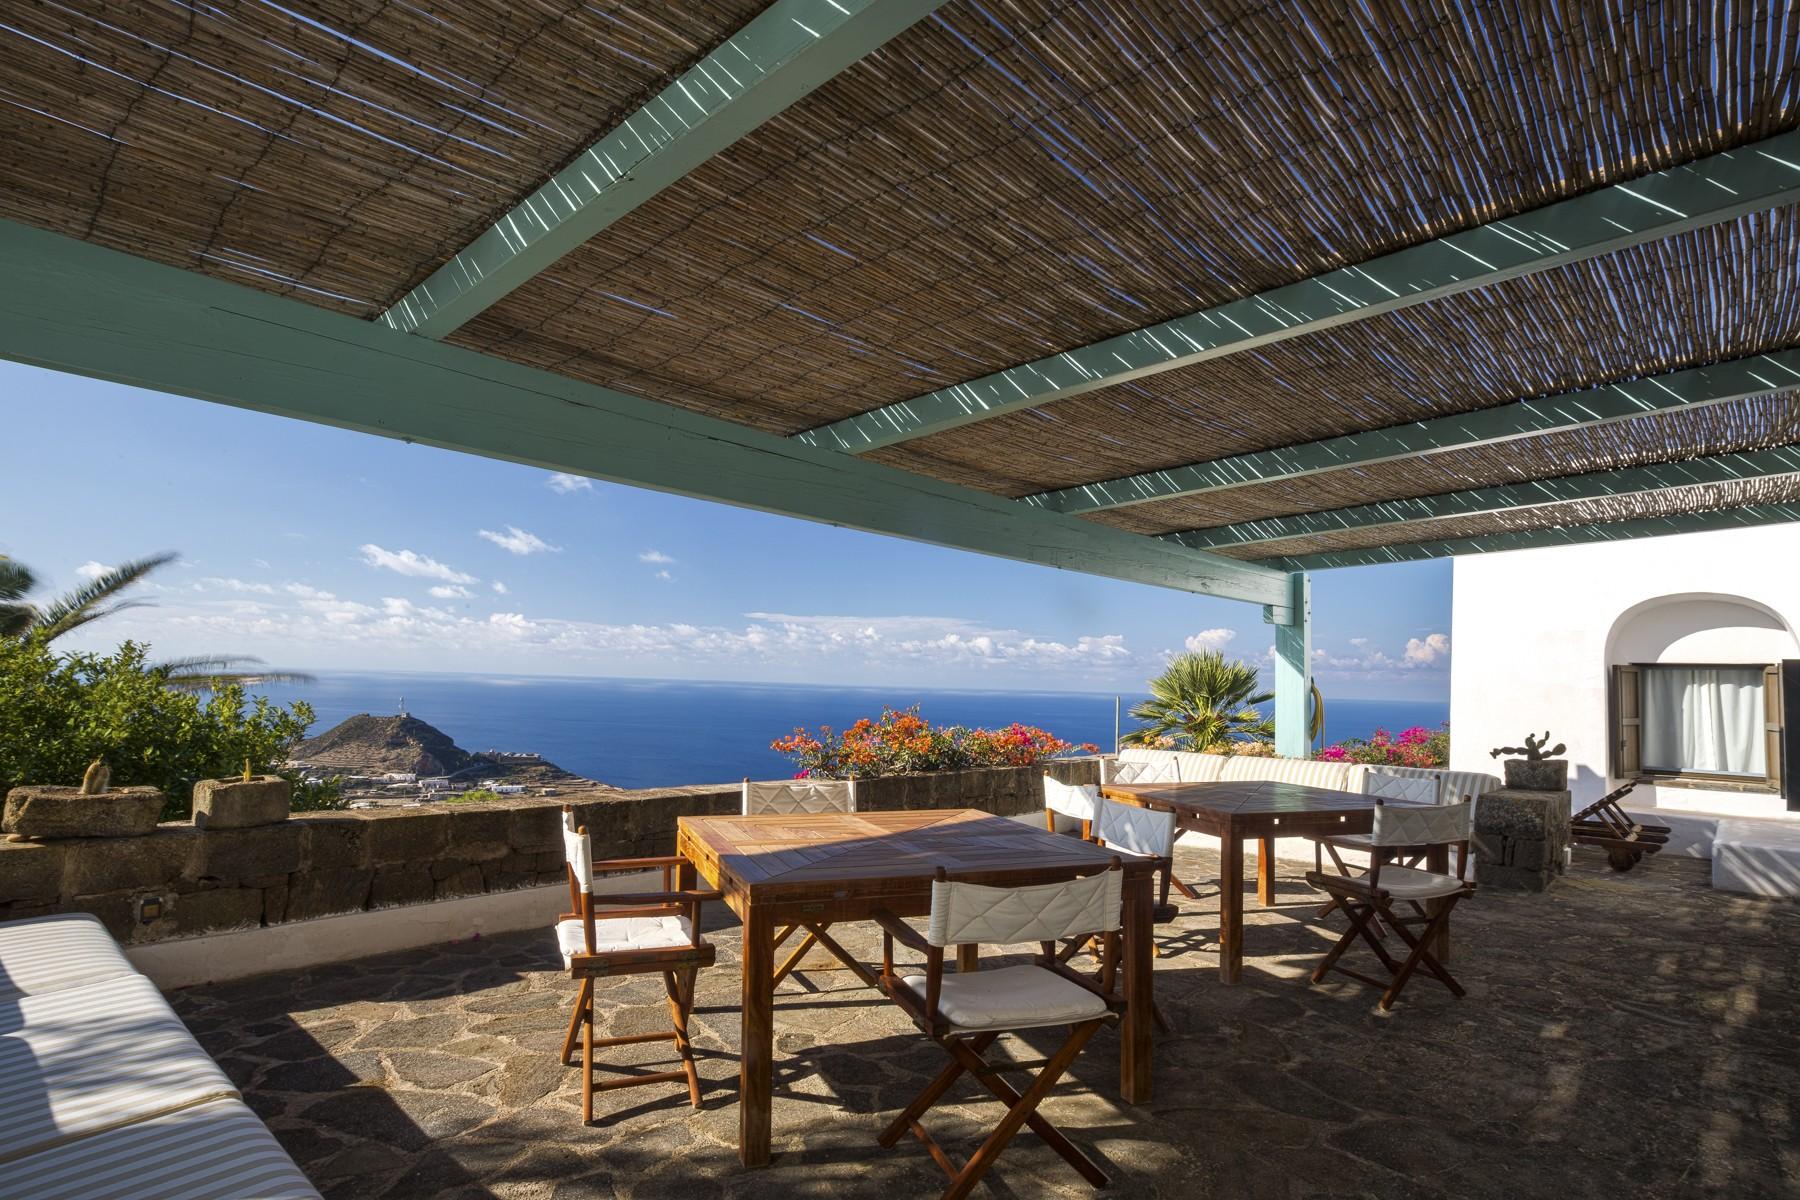 Villa in Vendita a Pantelleria: 5 locali, 530 mq - Foto 6